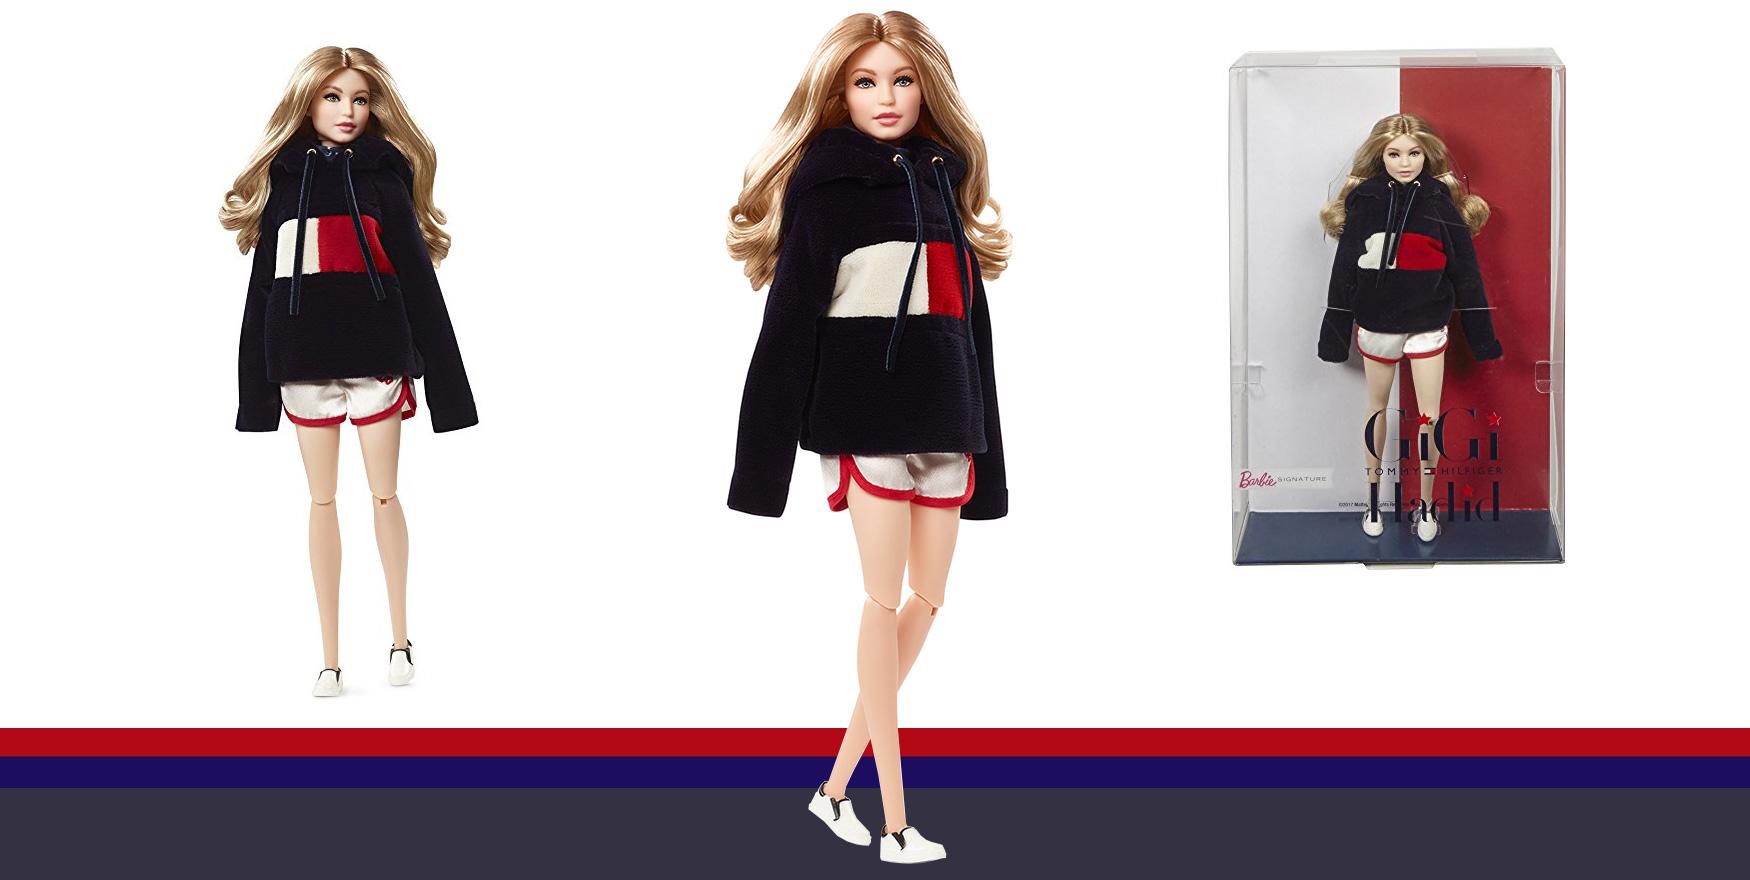 4513d705 Tommy Hilfiger's Gigi Hadid Iconic Barbie® Doll - Fashion Trendsetter